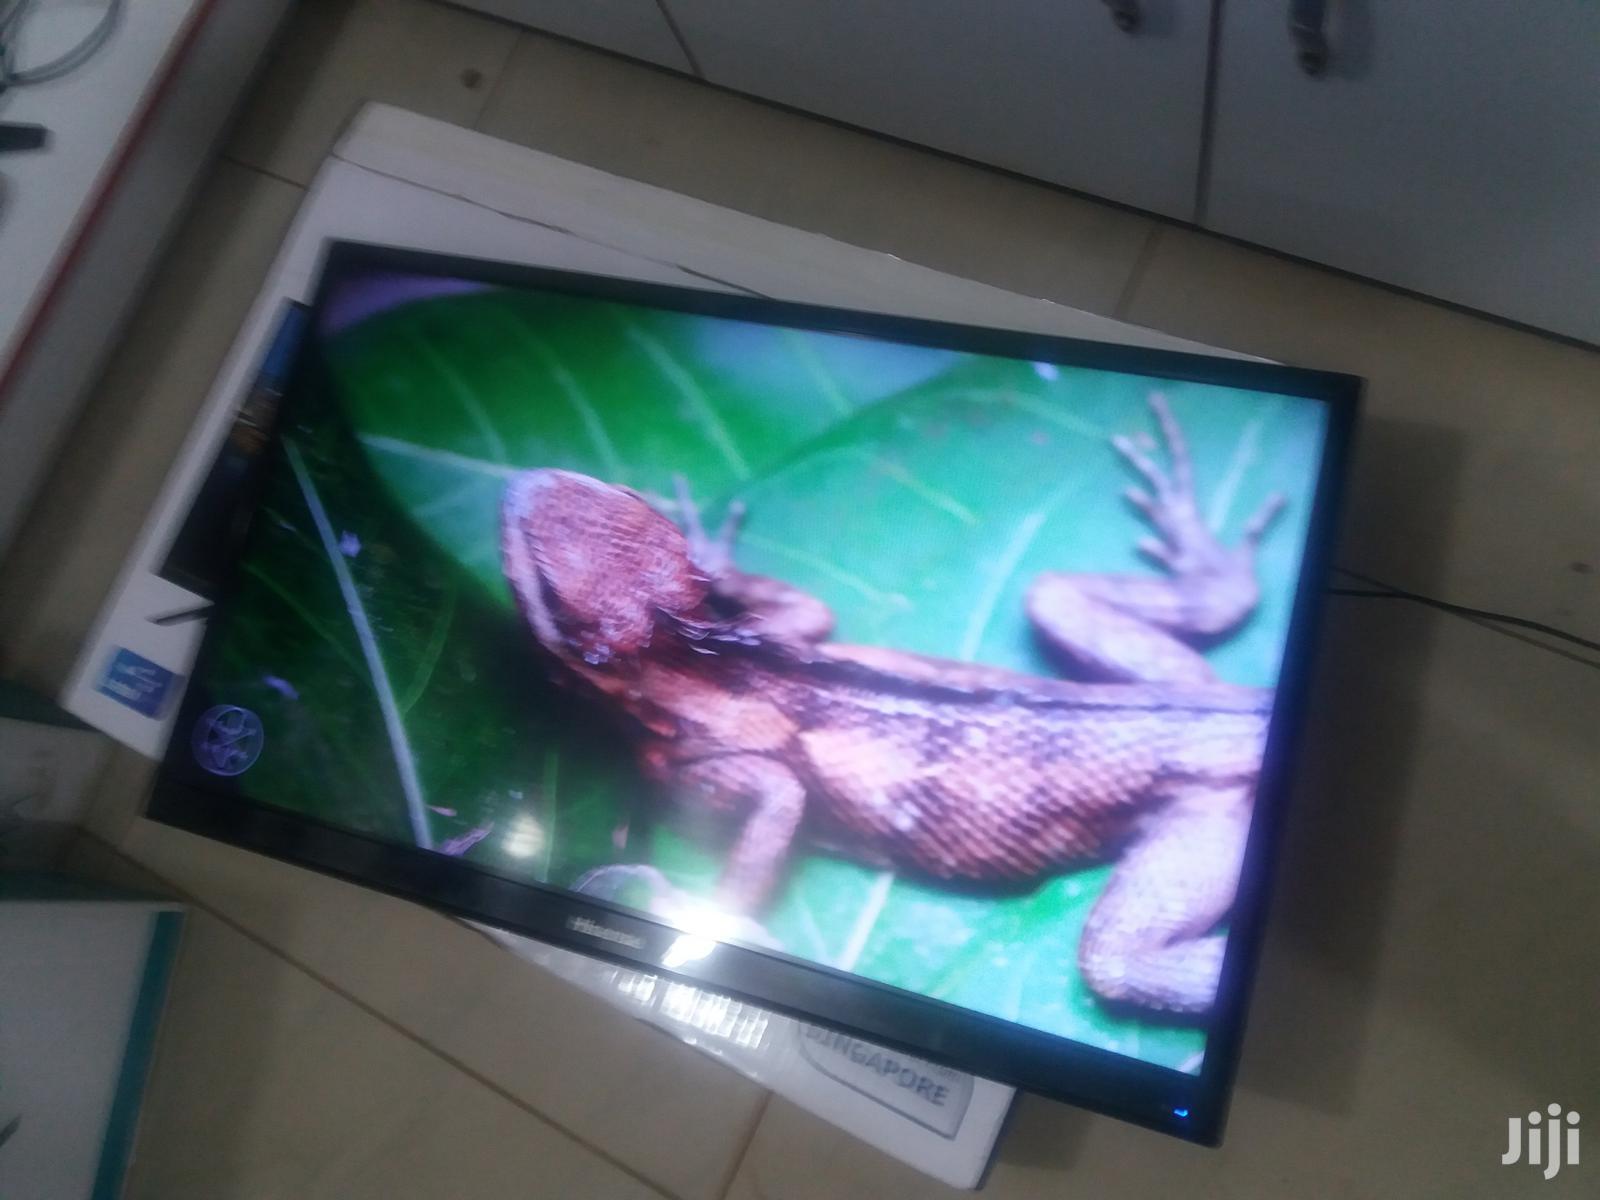 Archive: LG Flat Screen Digital TV 32 Inches